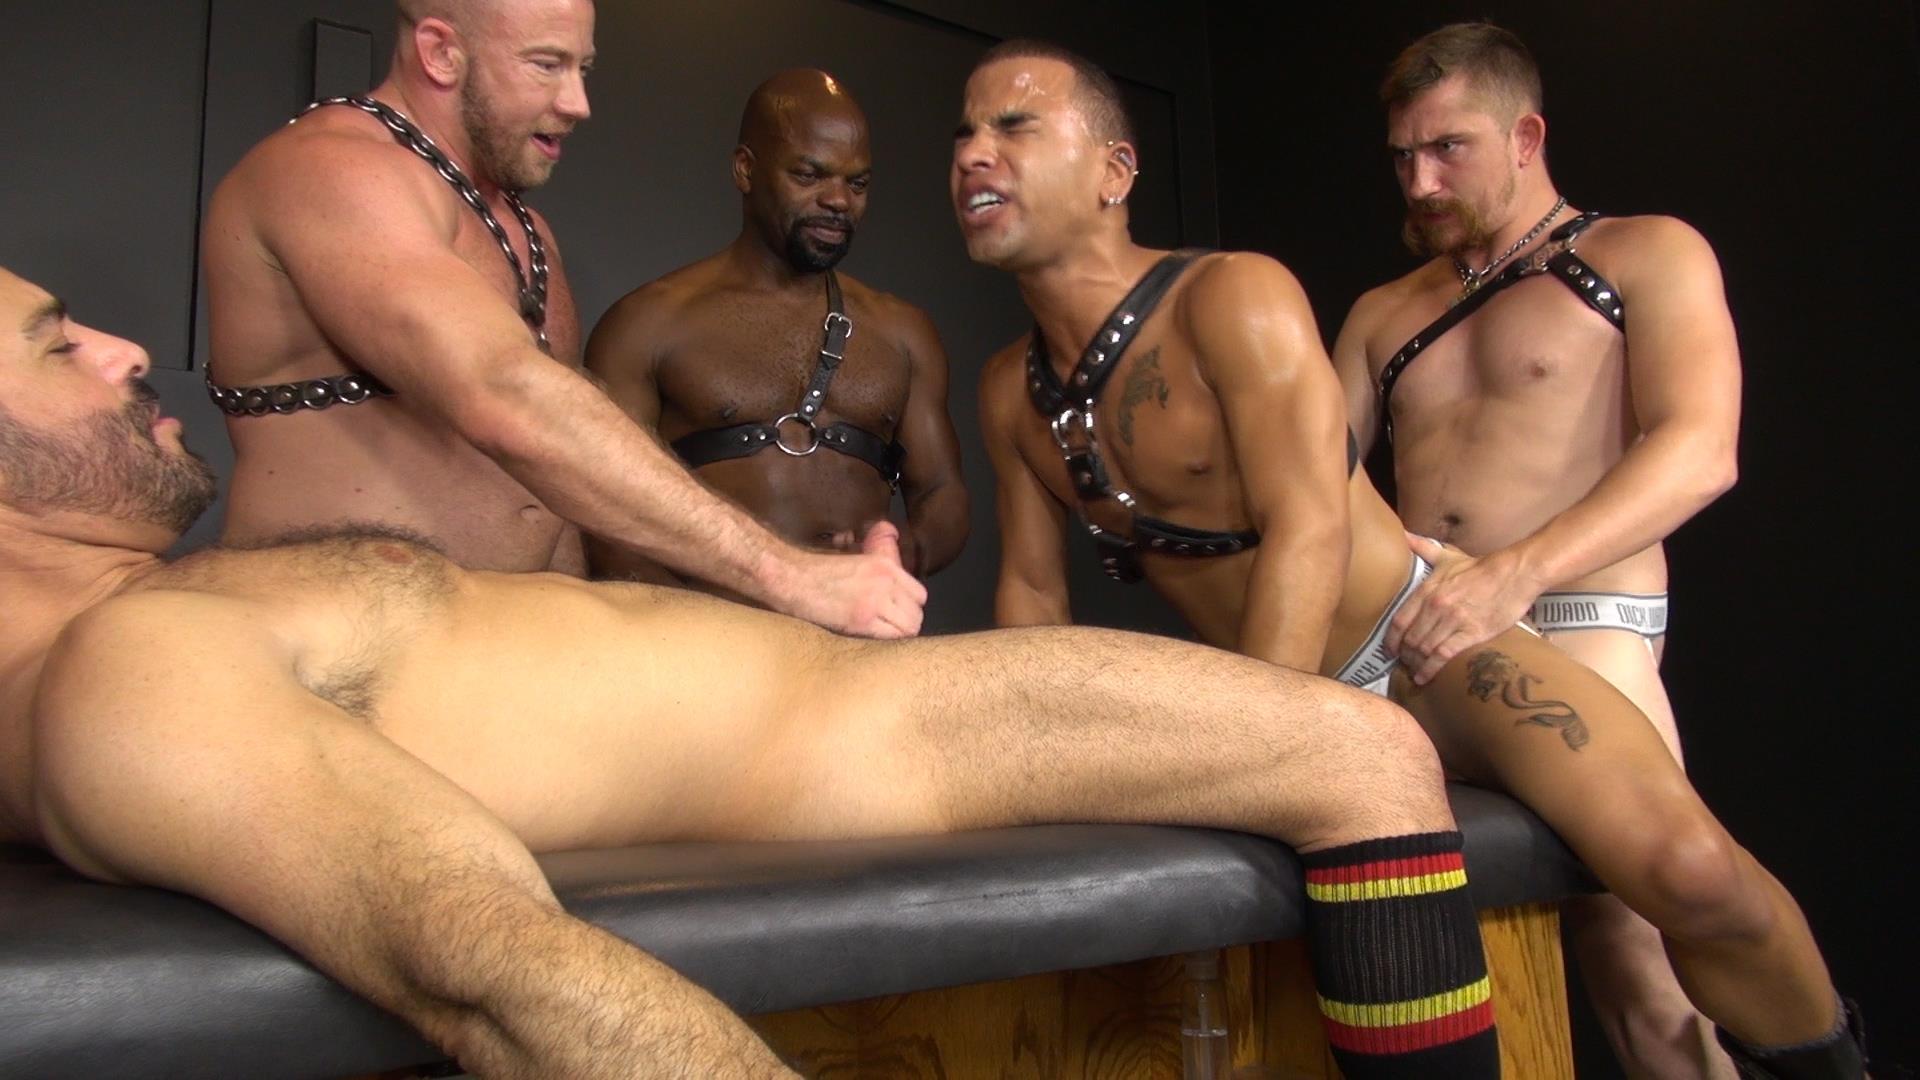 Raw-and-Rough-Ken-Byker-Dayton-OConnor-Trelino-Shay-Michaels-Adam-Russo-Cutler-X-Interracial-Bareback-Orgy-Amateur-Gay-Porn-08 Interracial Bareback Orgy With Adam Russo & Cutler X